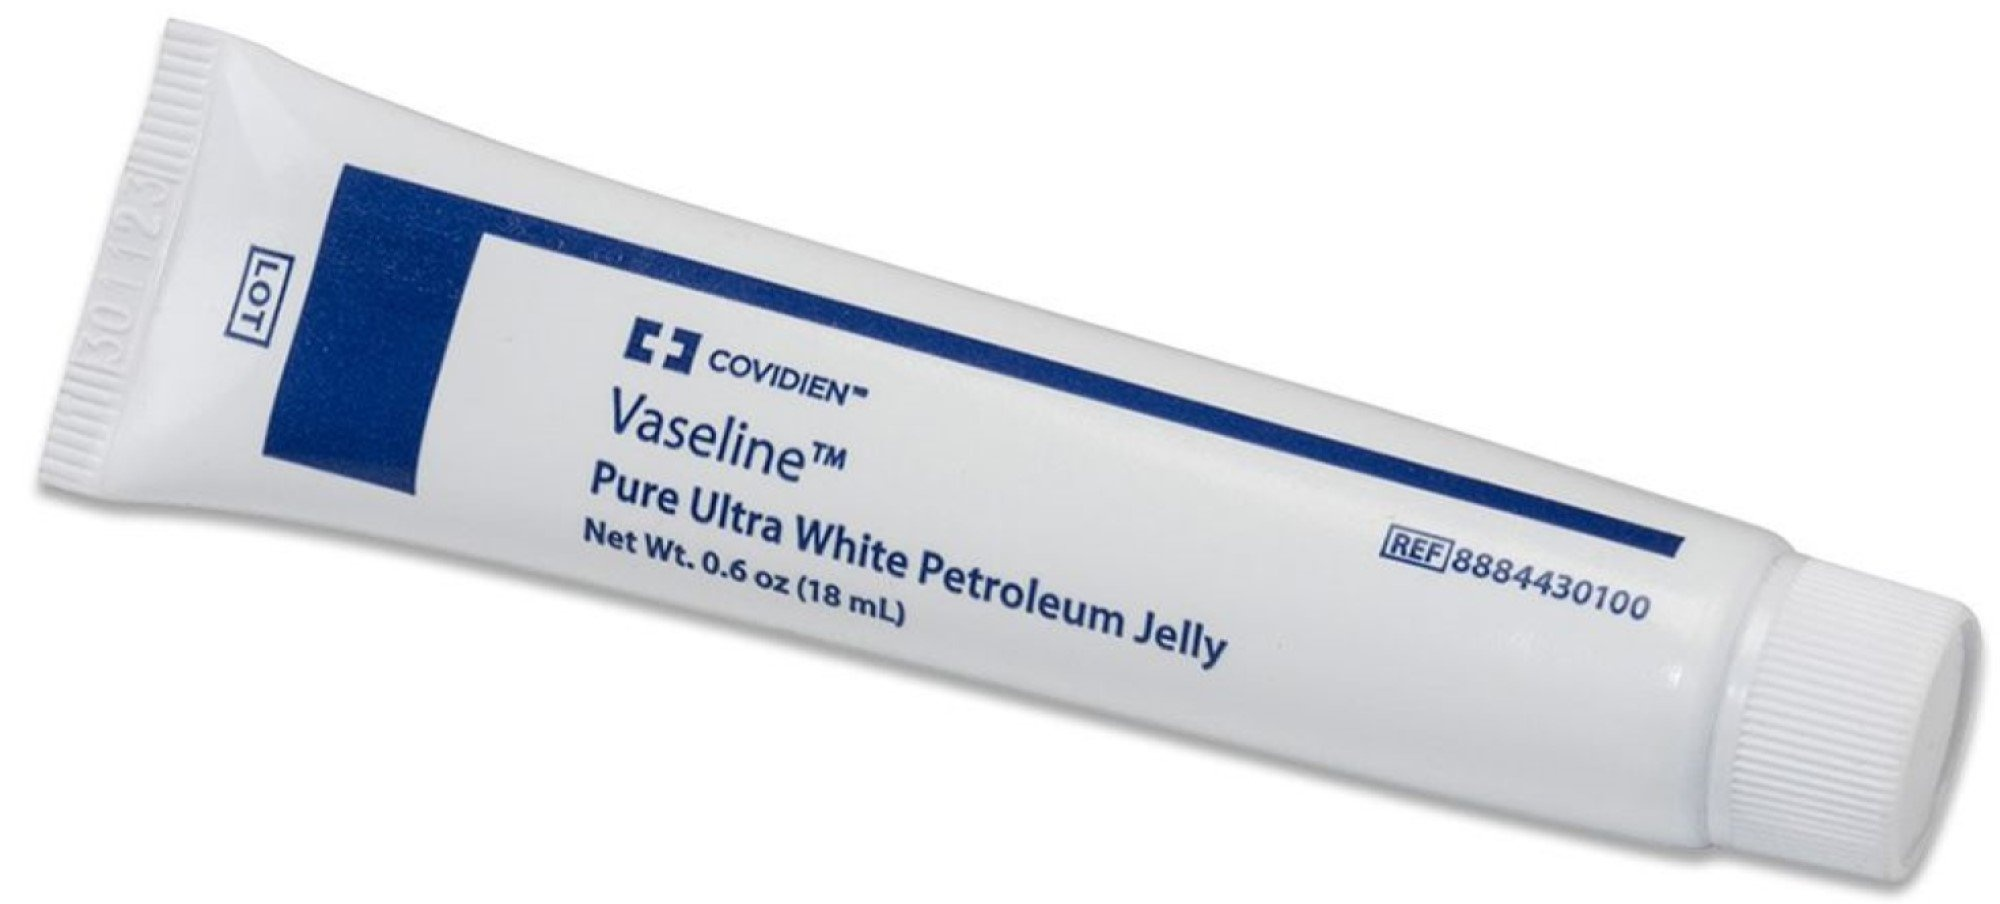 Covidien Vaseline Petroleum Jelly, 8884430200, 1 oz. - Pack of 12